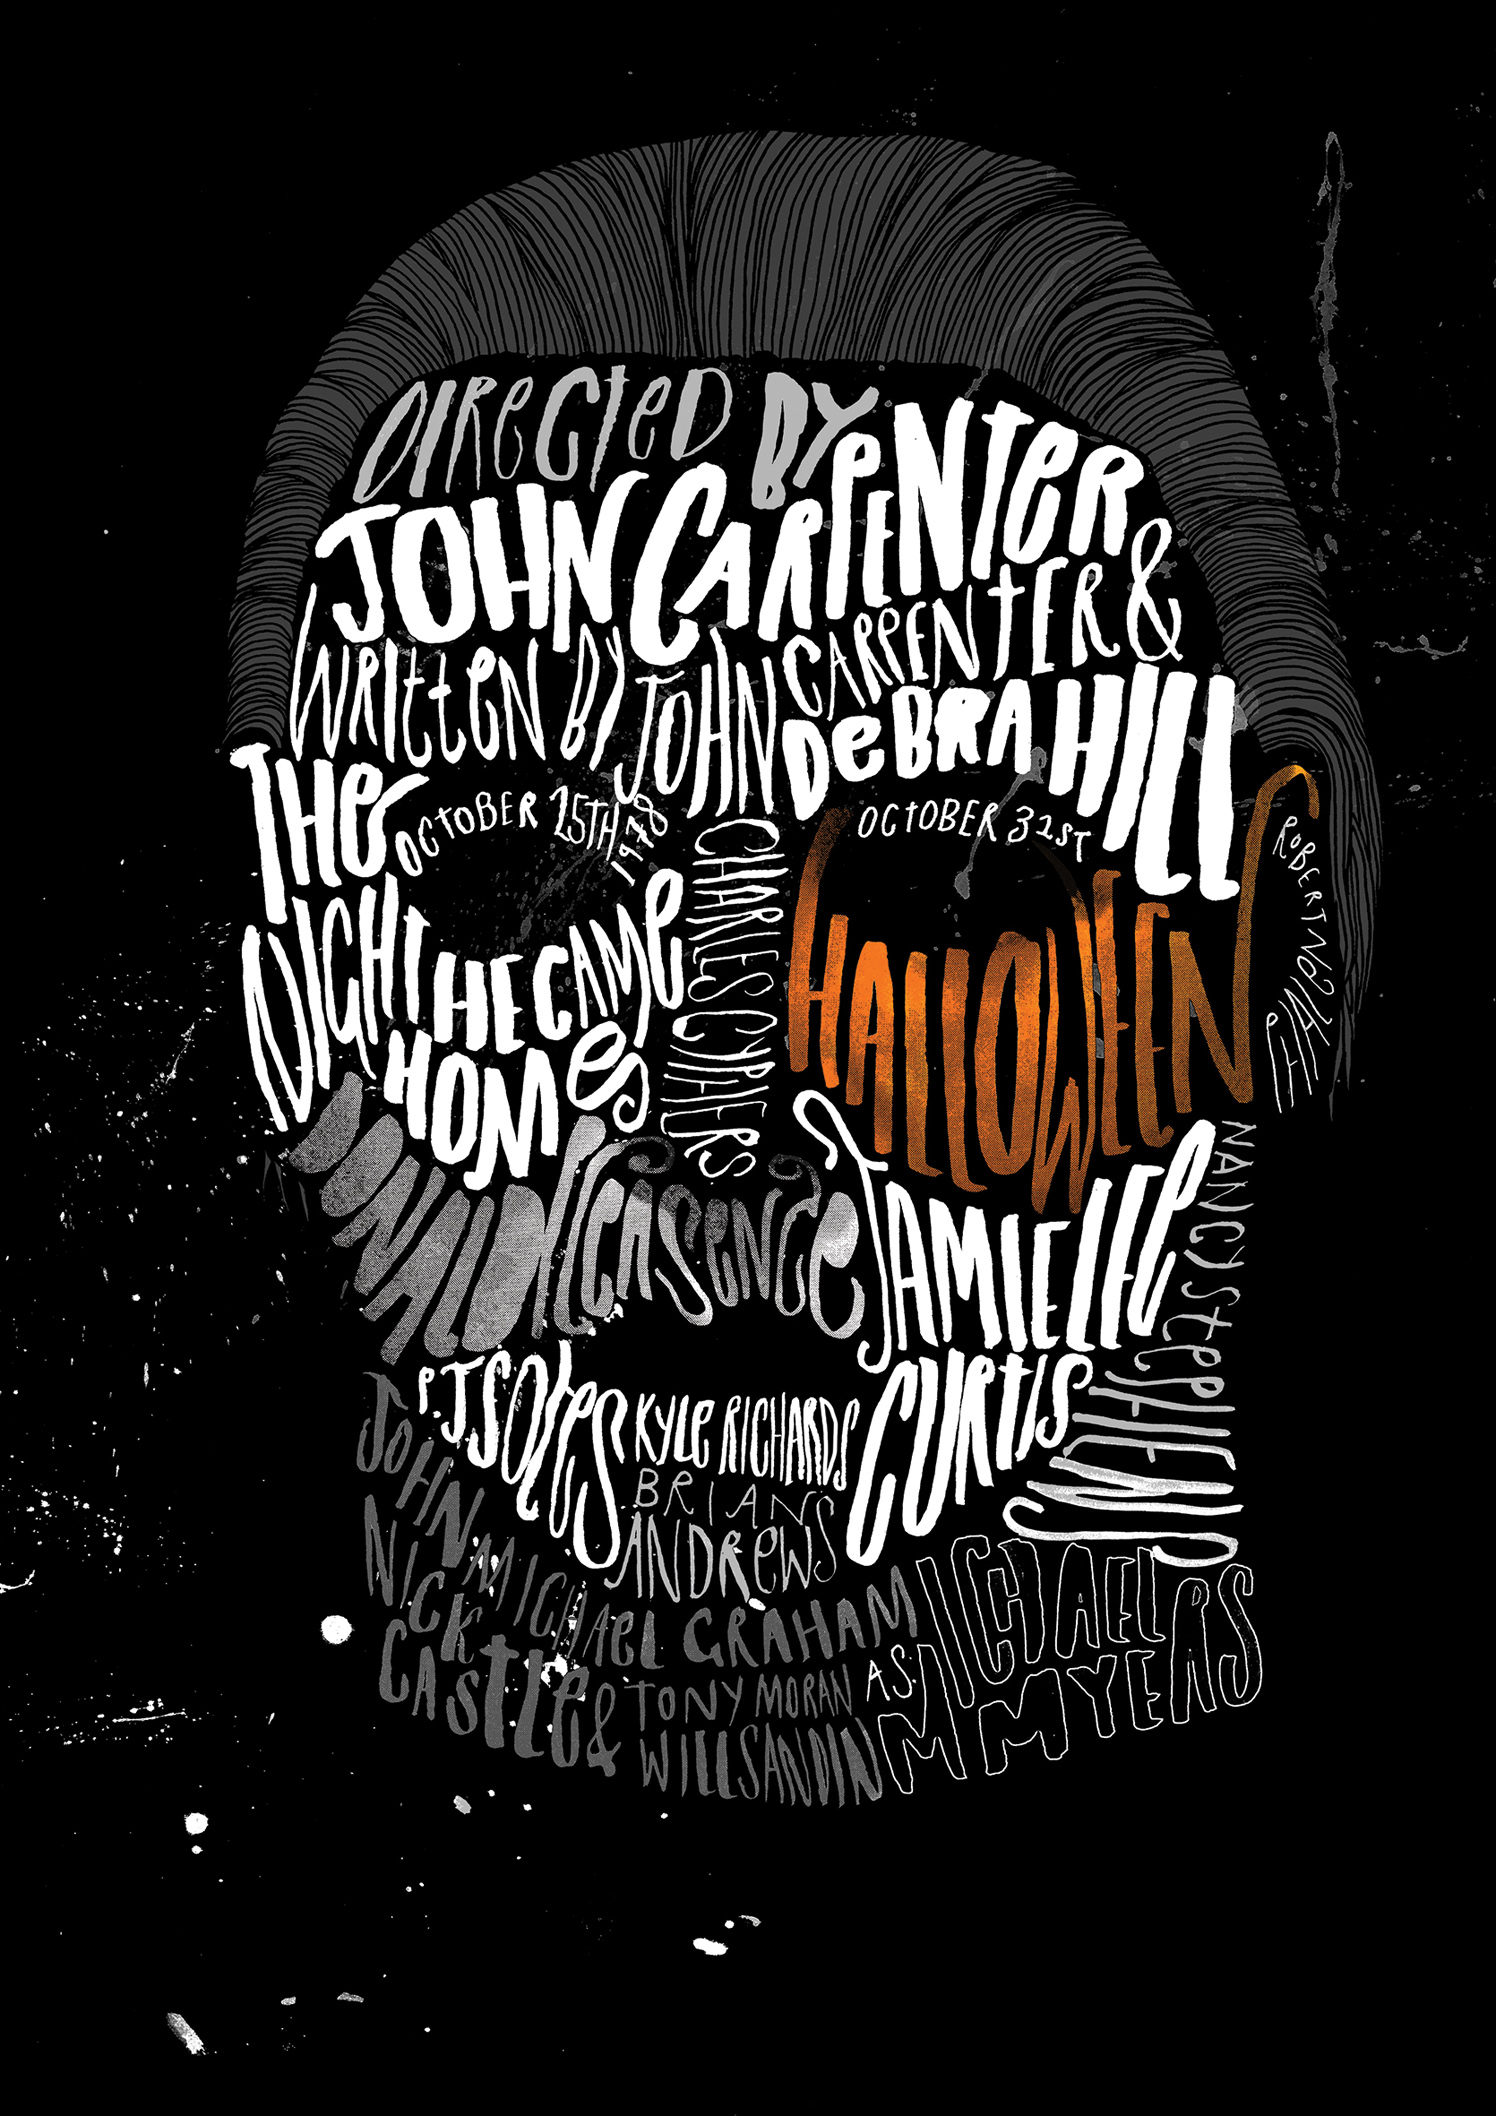 Michael Myers / Halloween Poster